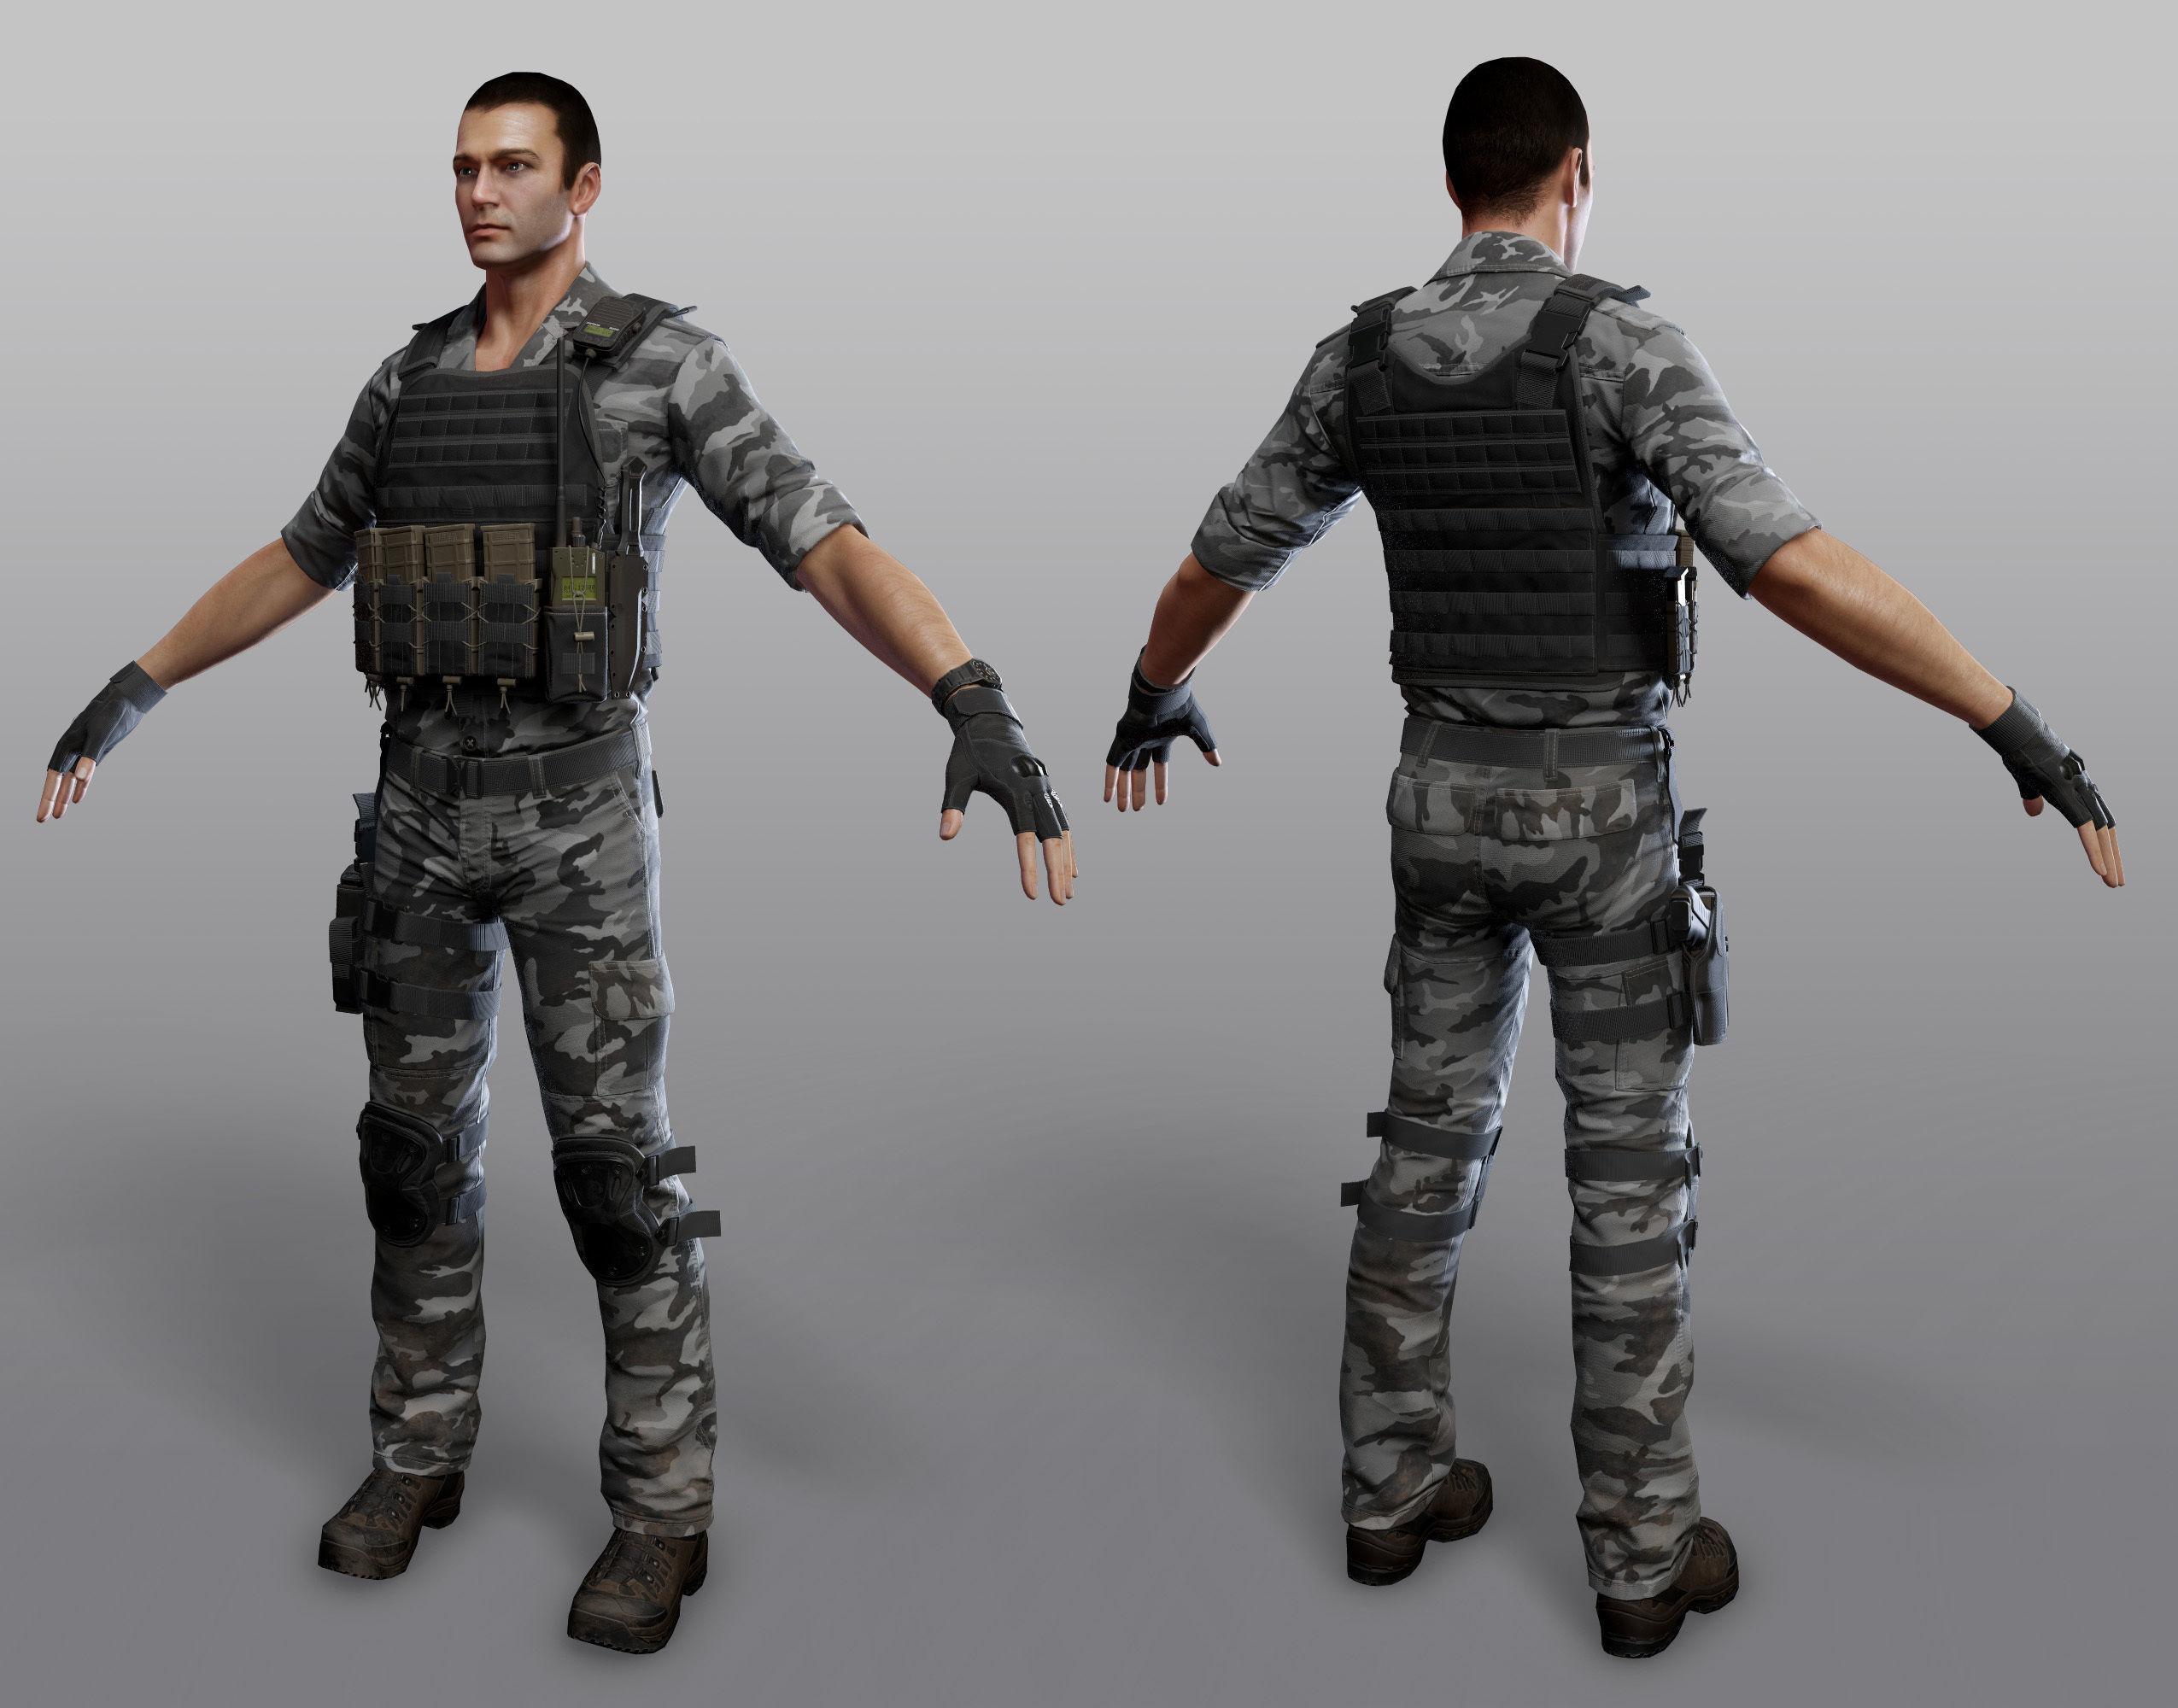 JENNIFER: Army man pics